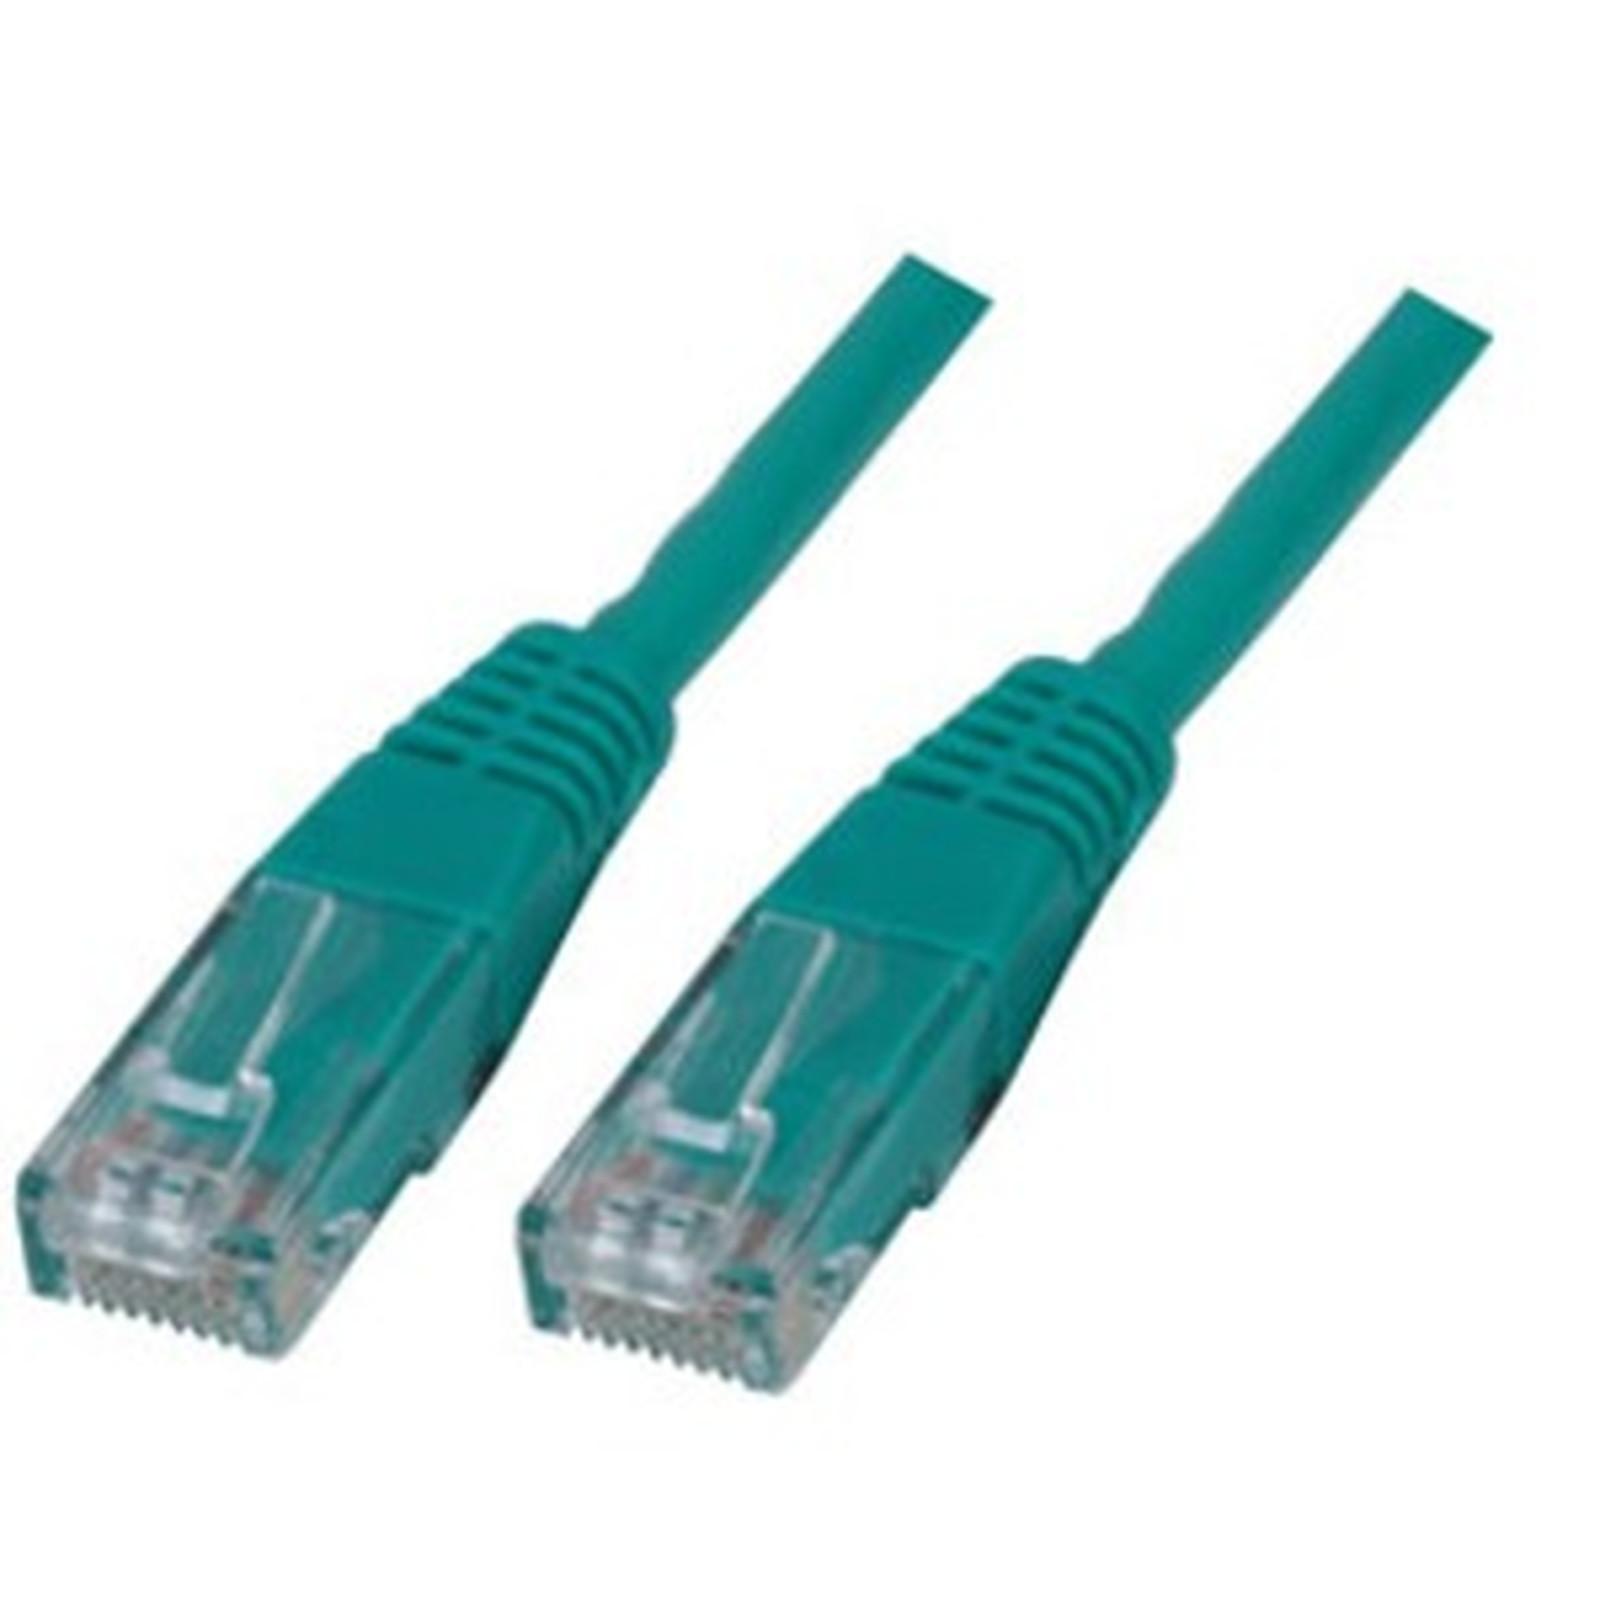 Cable RJ45 de categoría 6 U/UTP 10 m (verde)